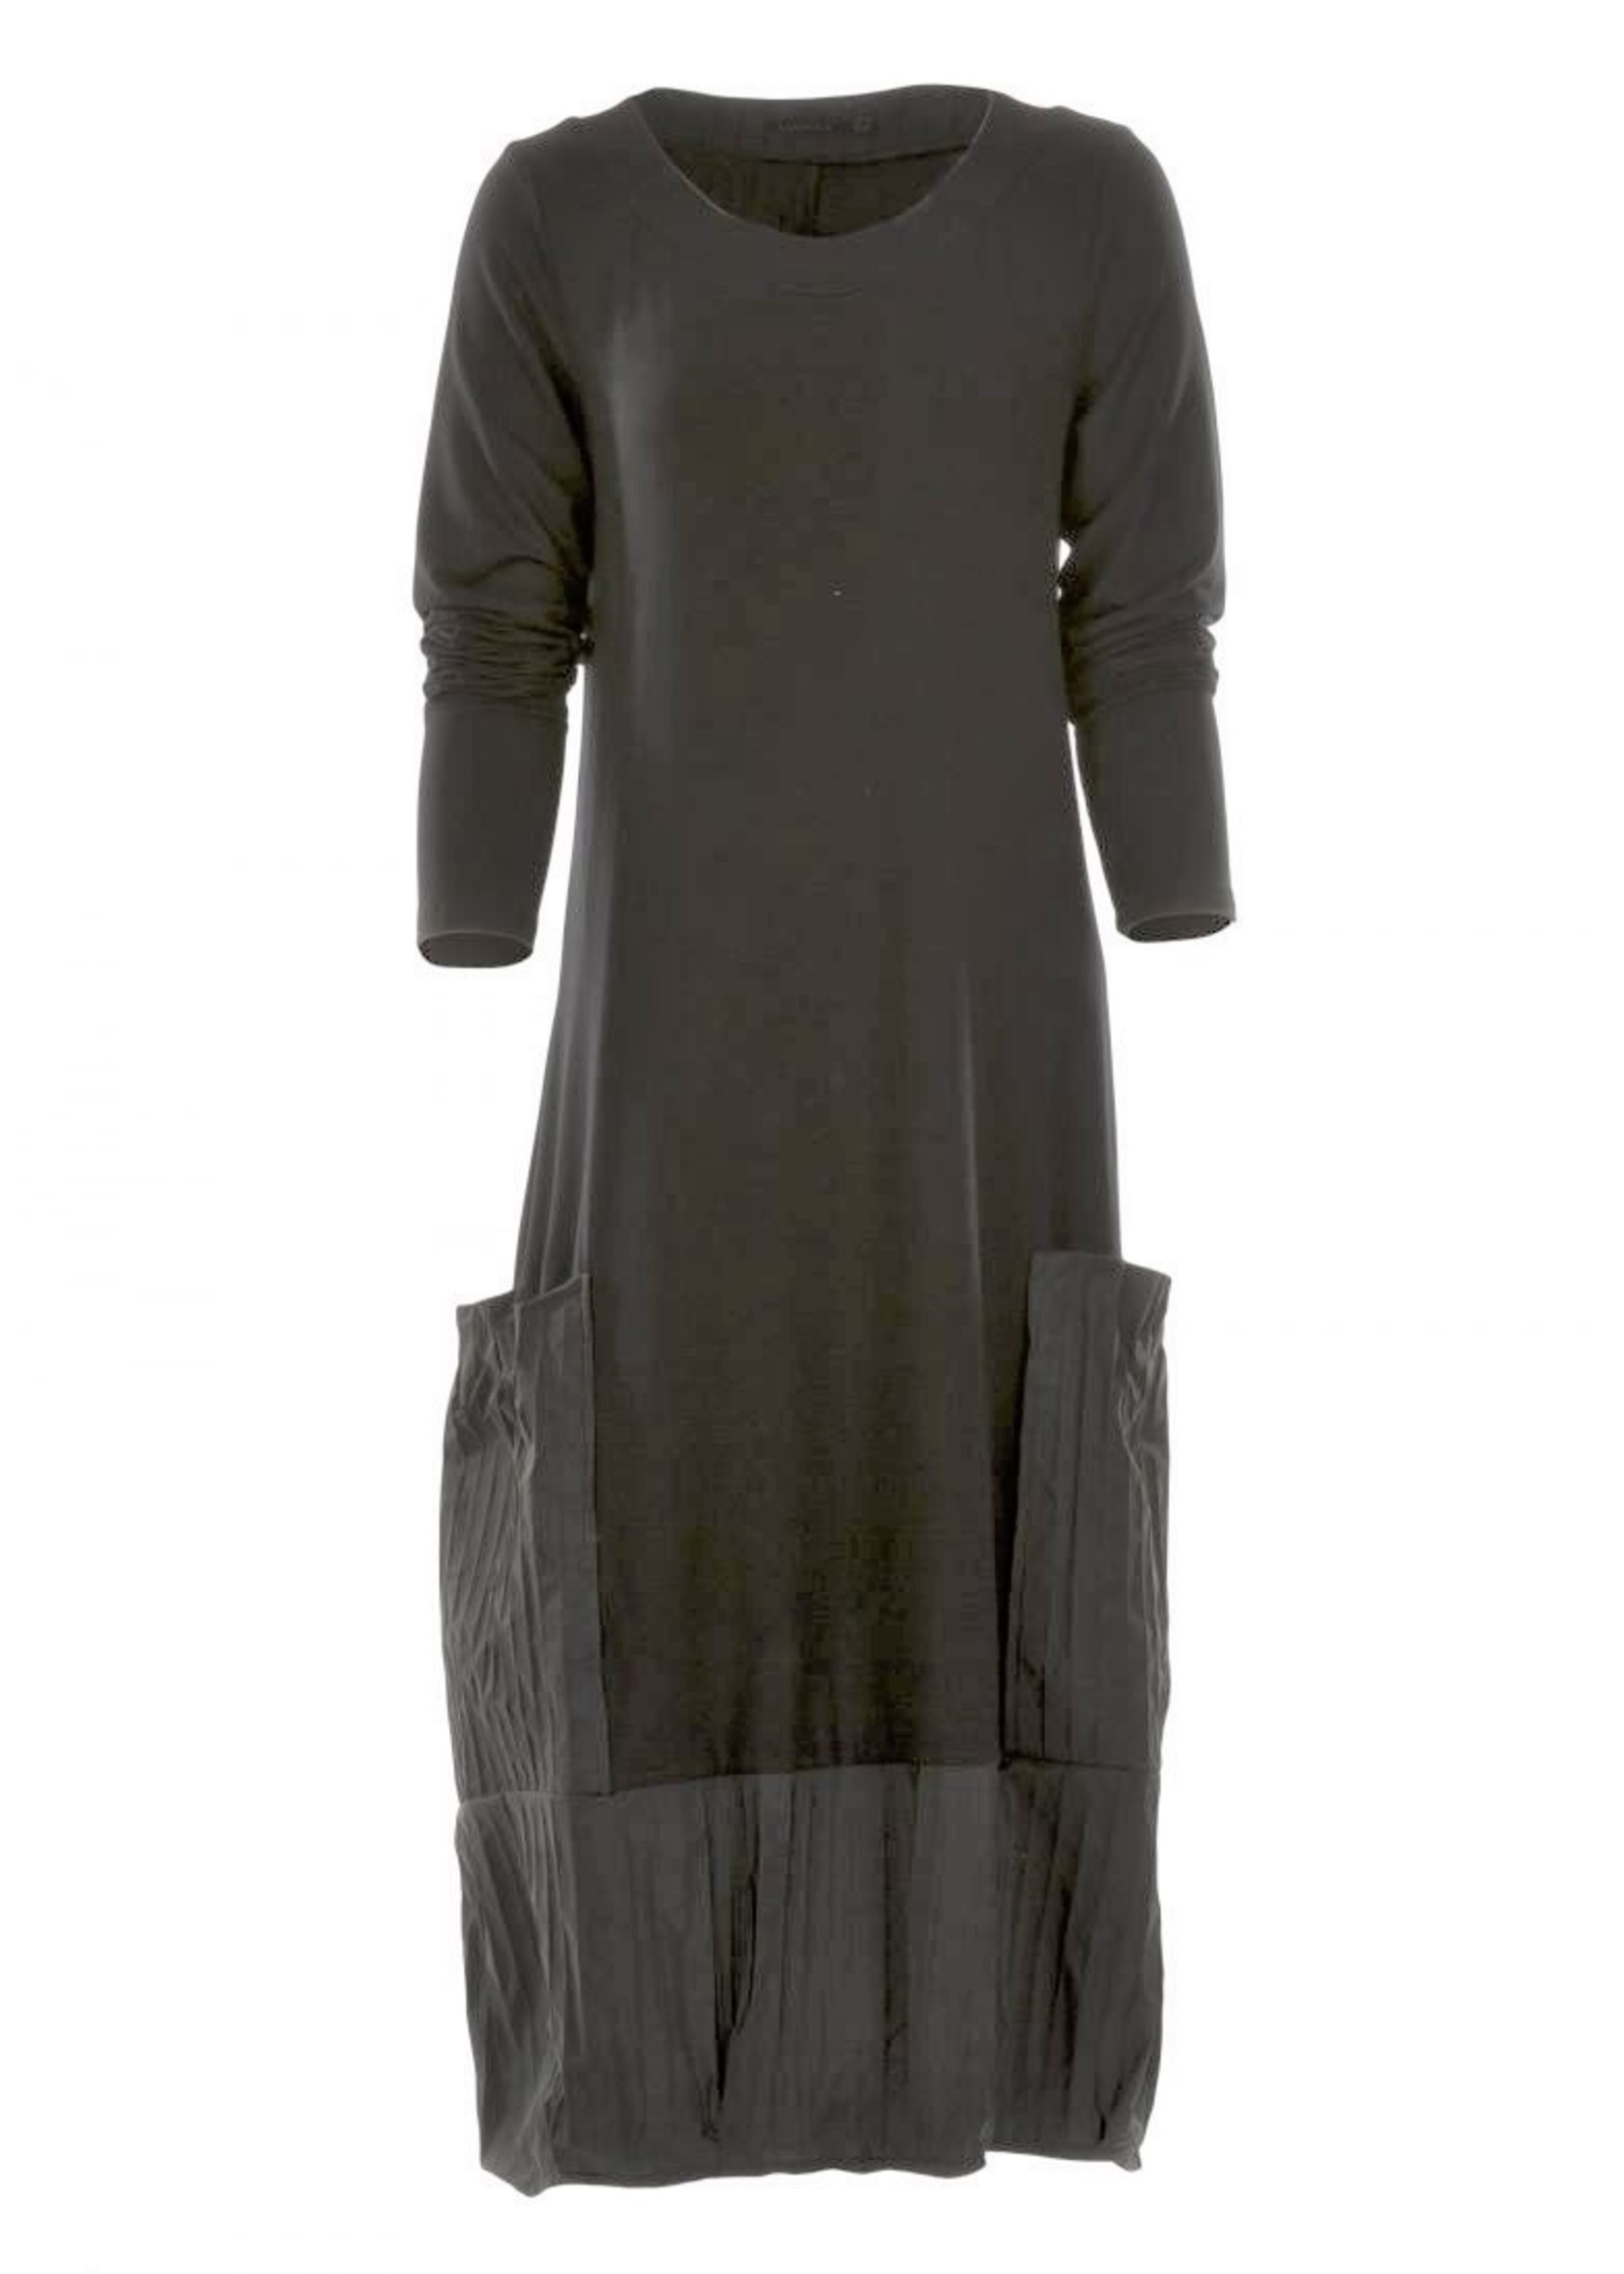 LUUKAA 20k514 martha dress